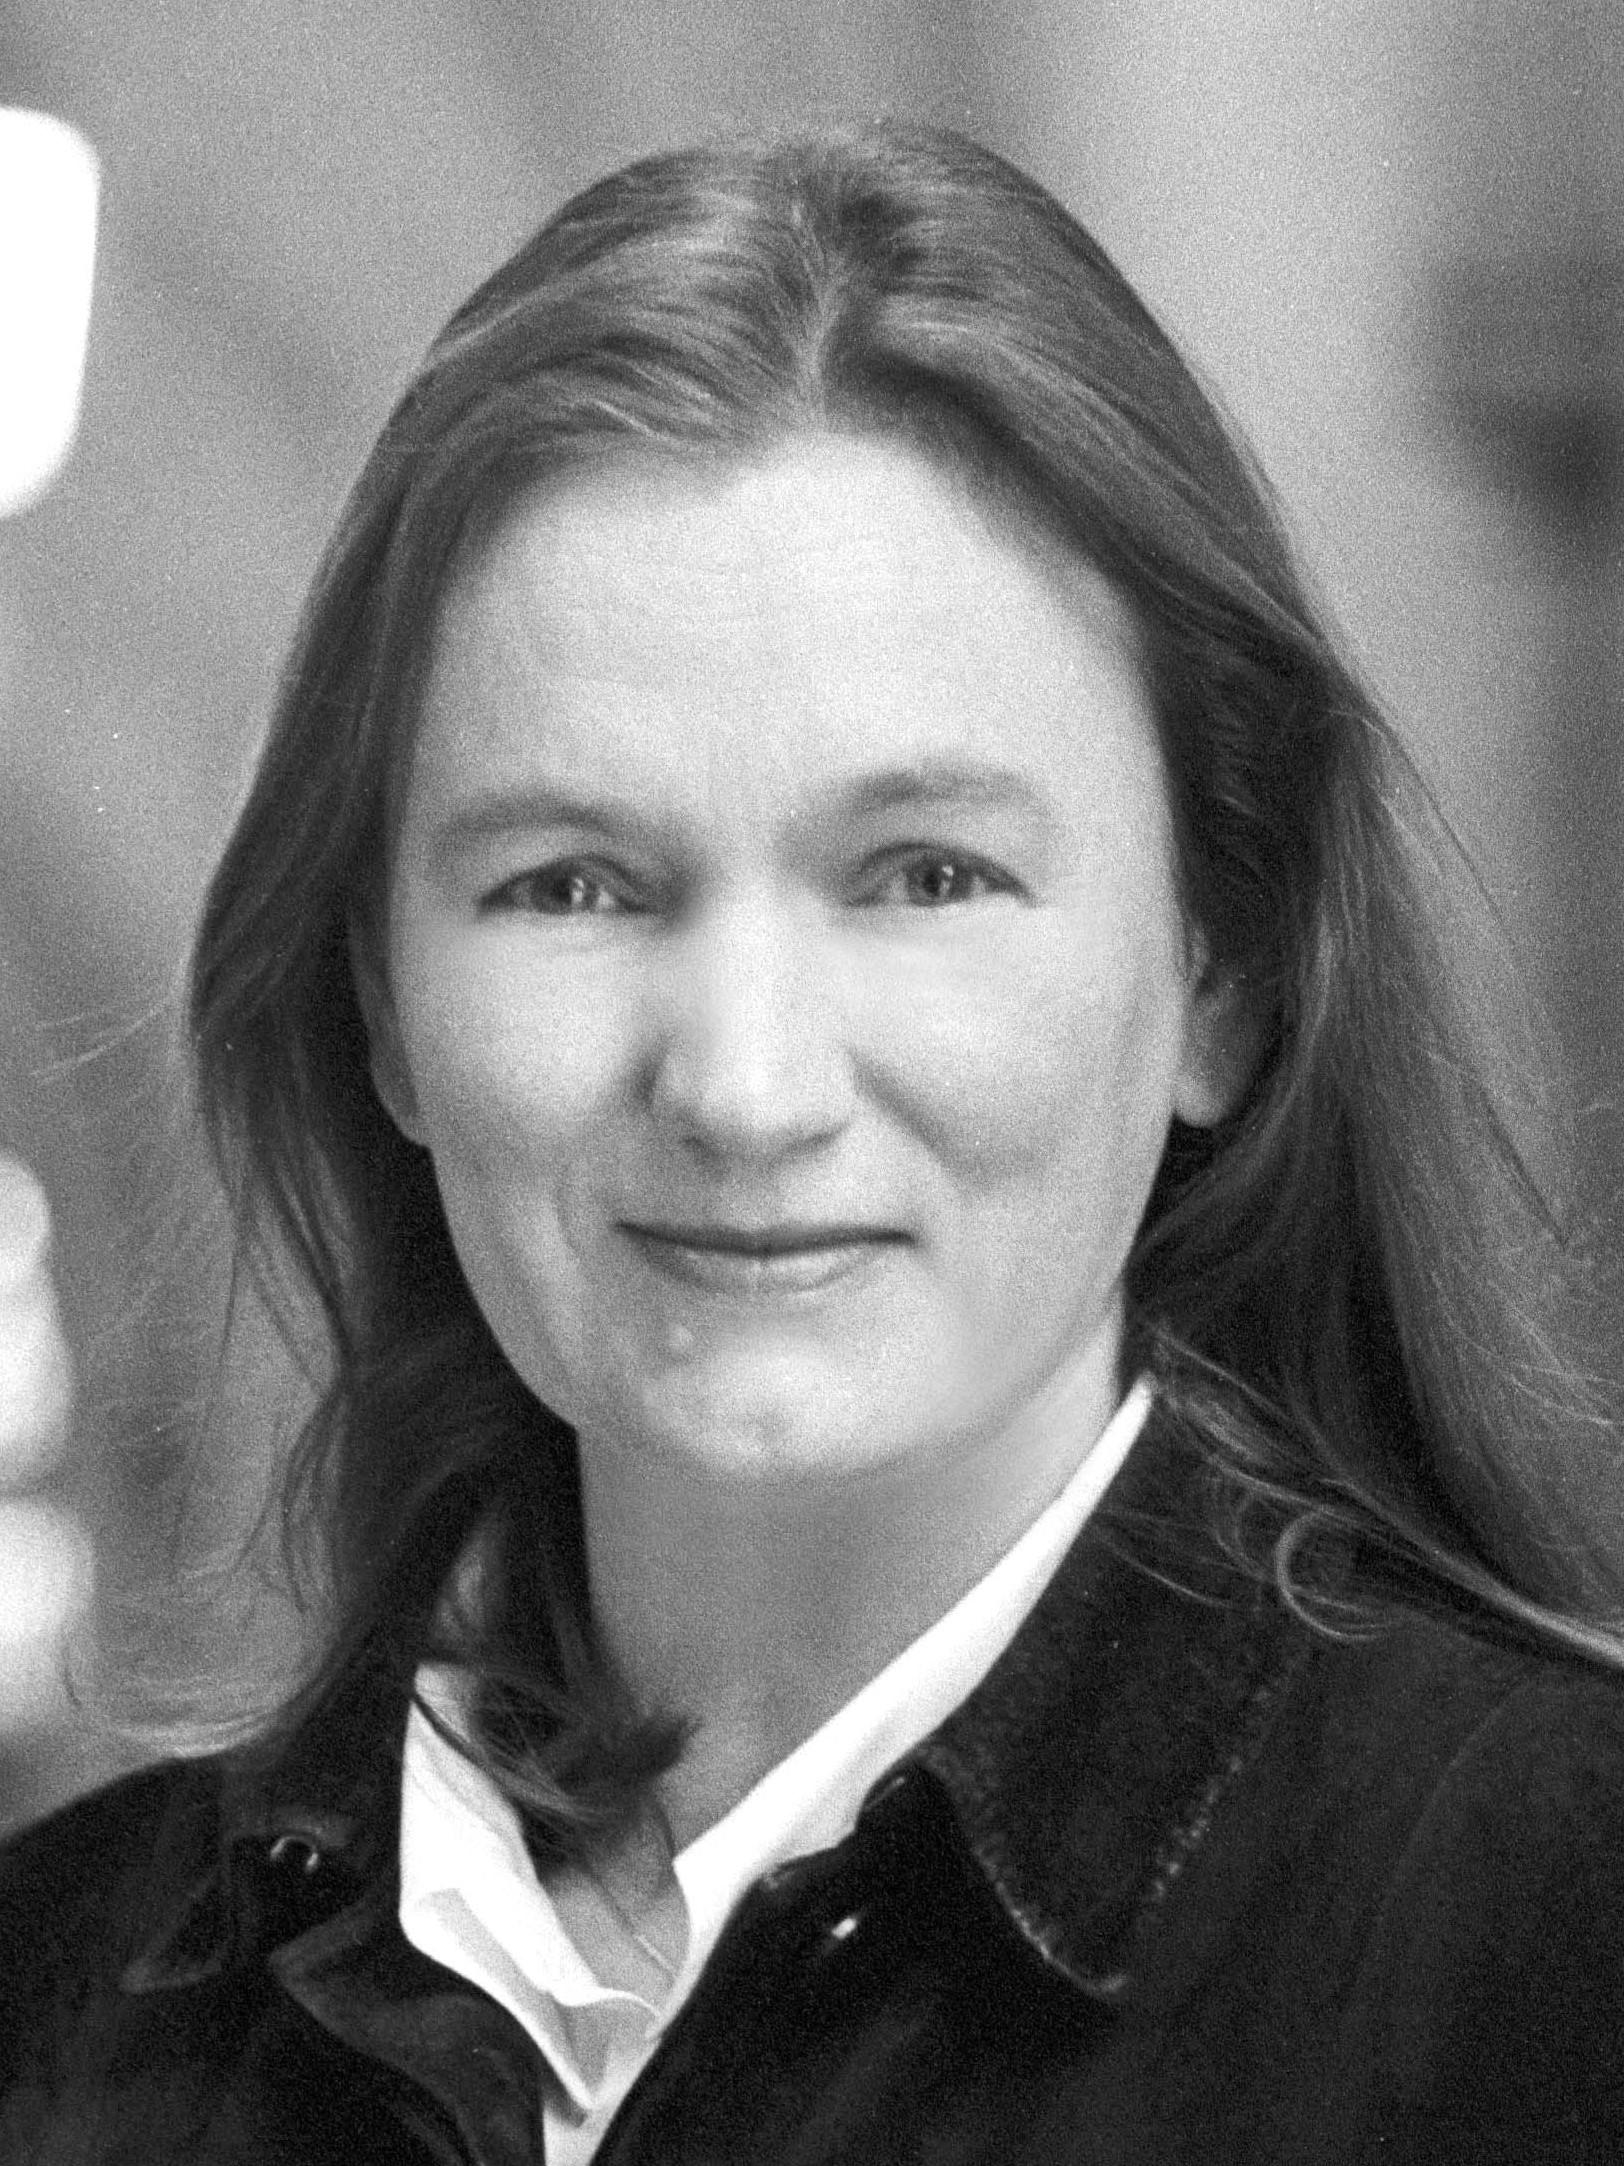 Linda Buckley-Archer